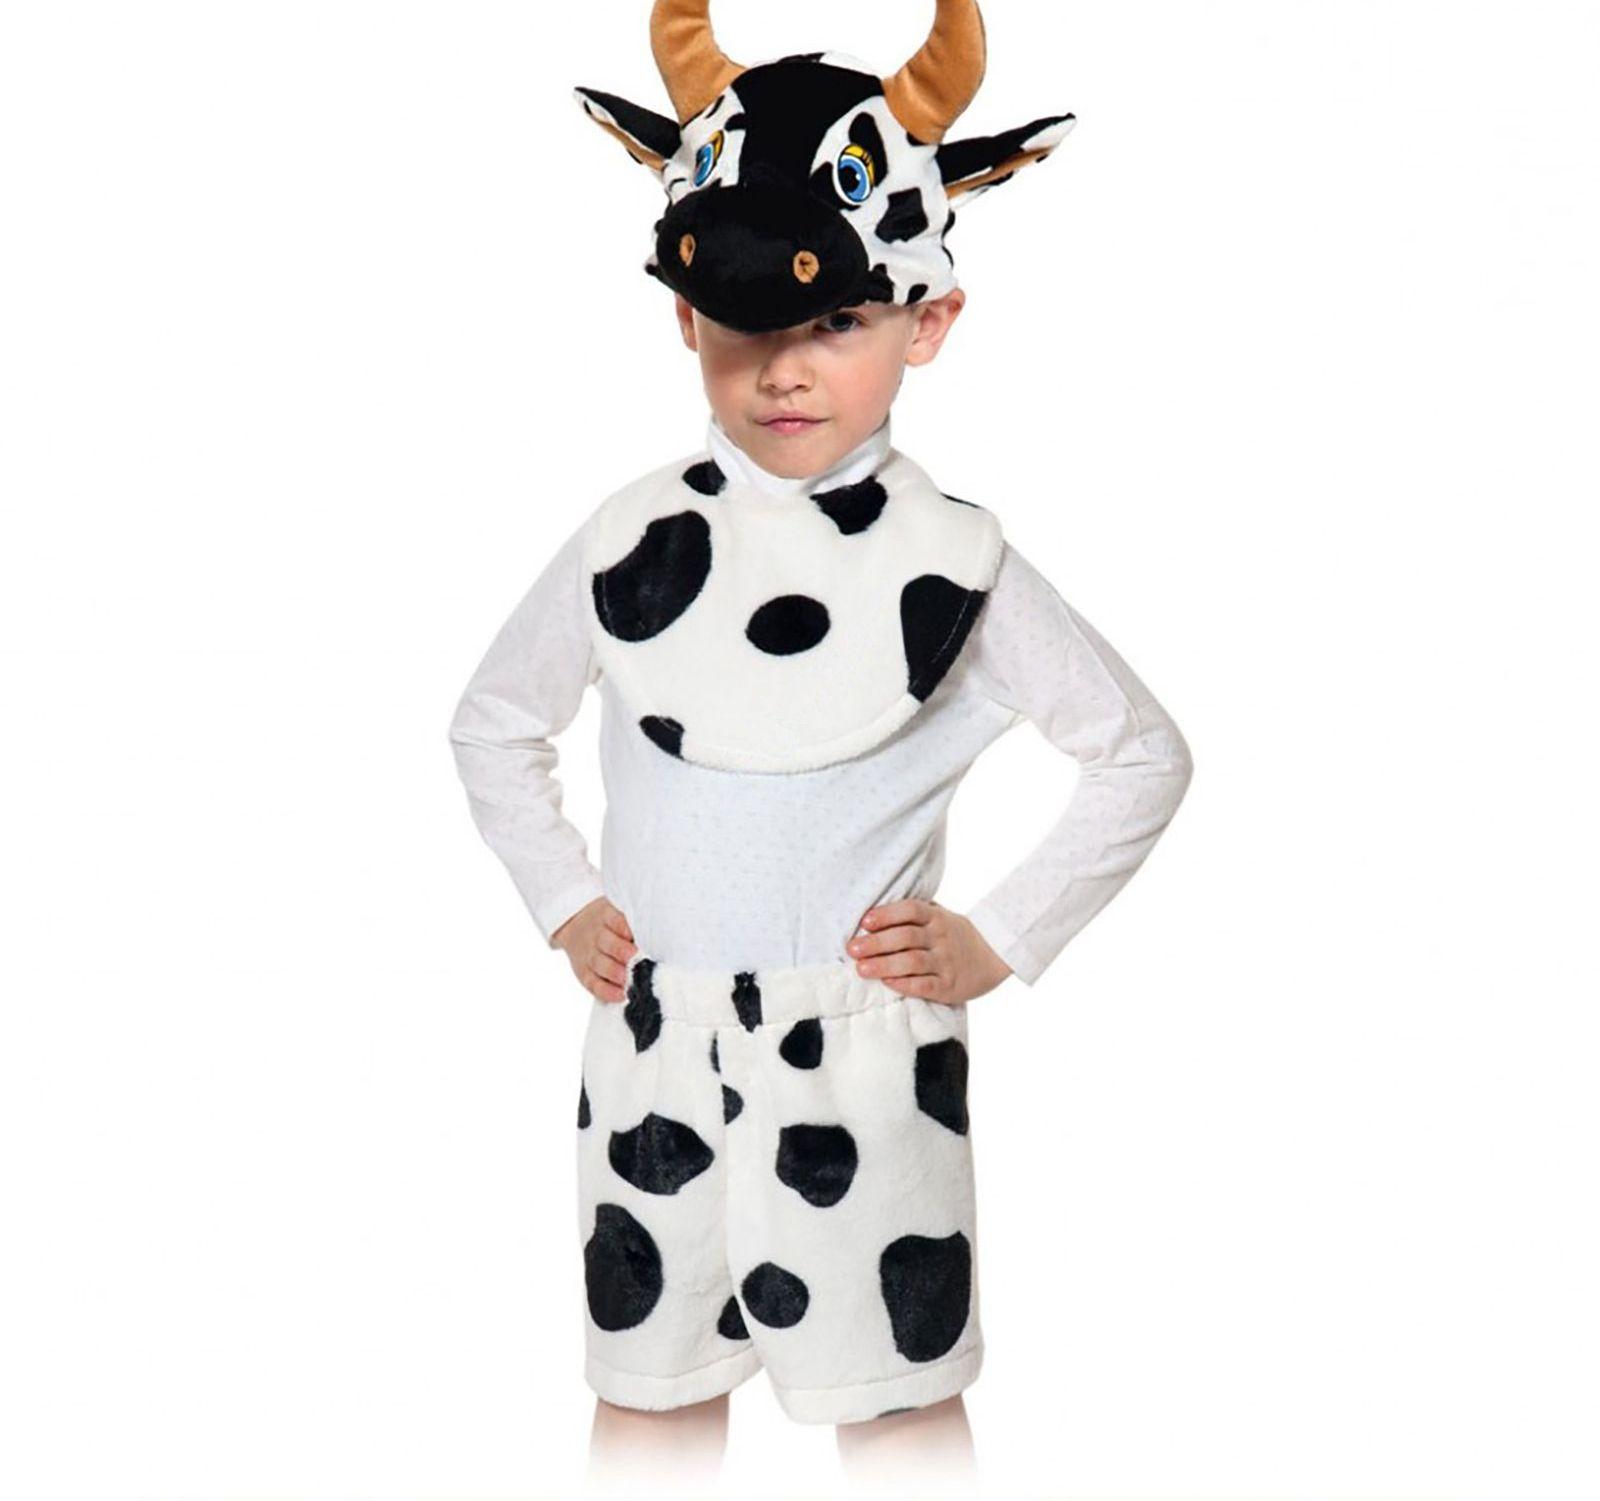 карнавальный костюм быка